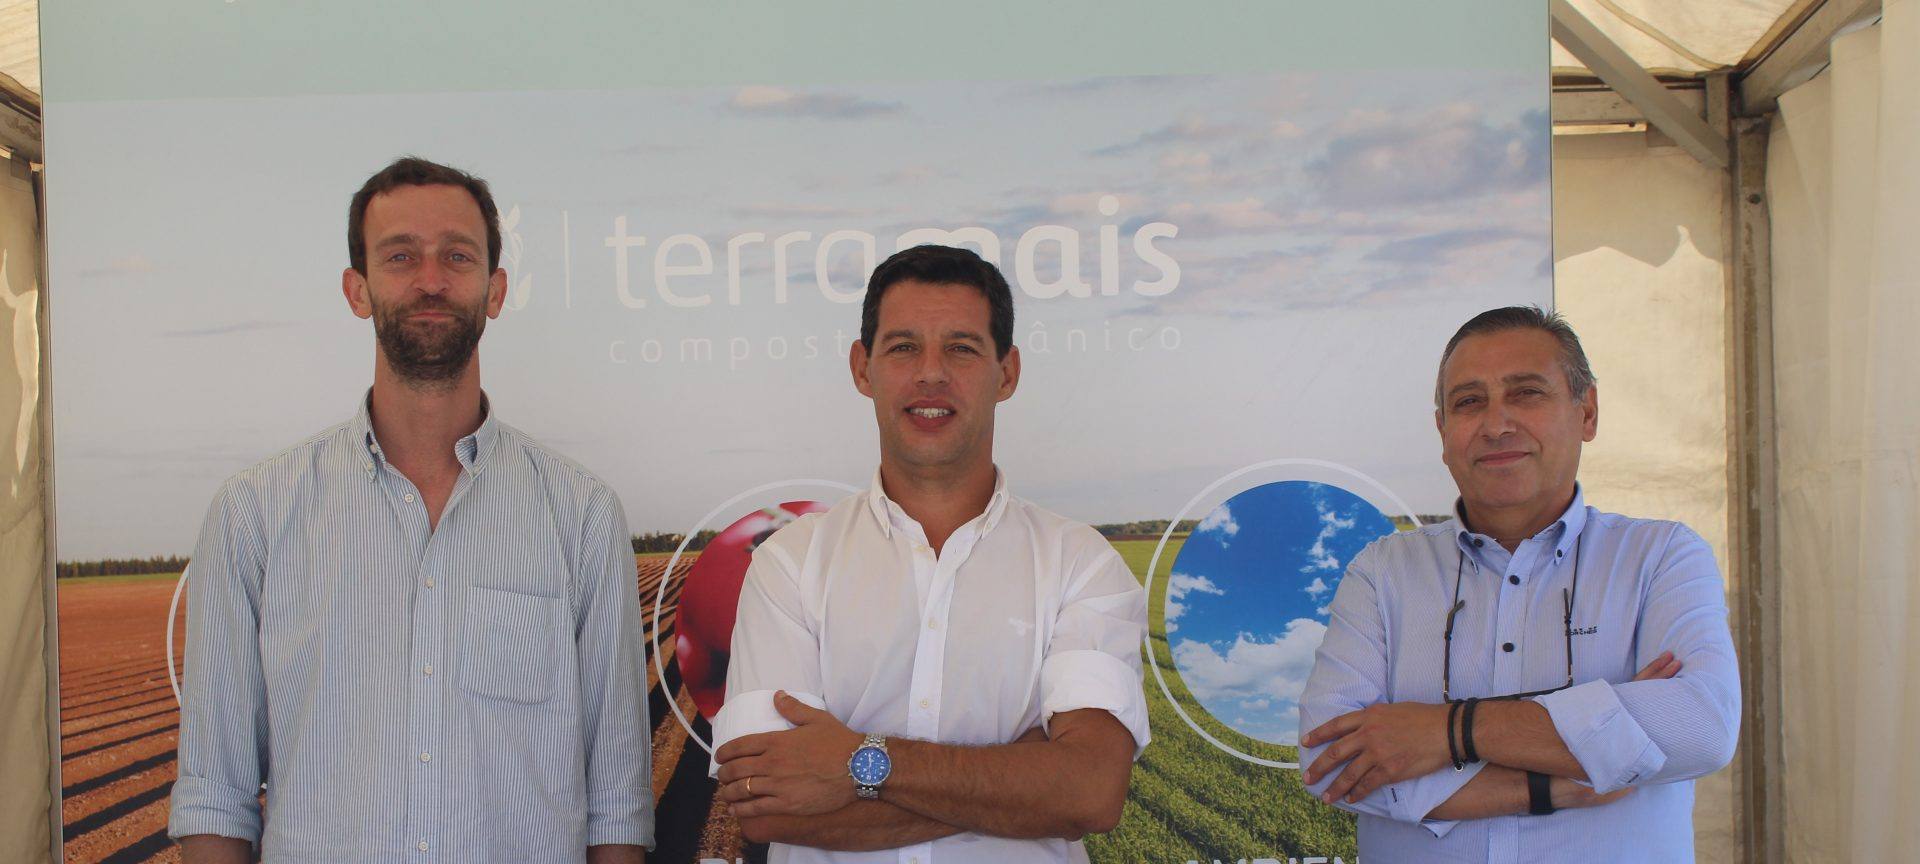 feria agrícola Agroglobal portugal compuesto orgánico